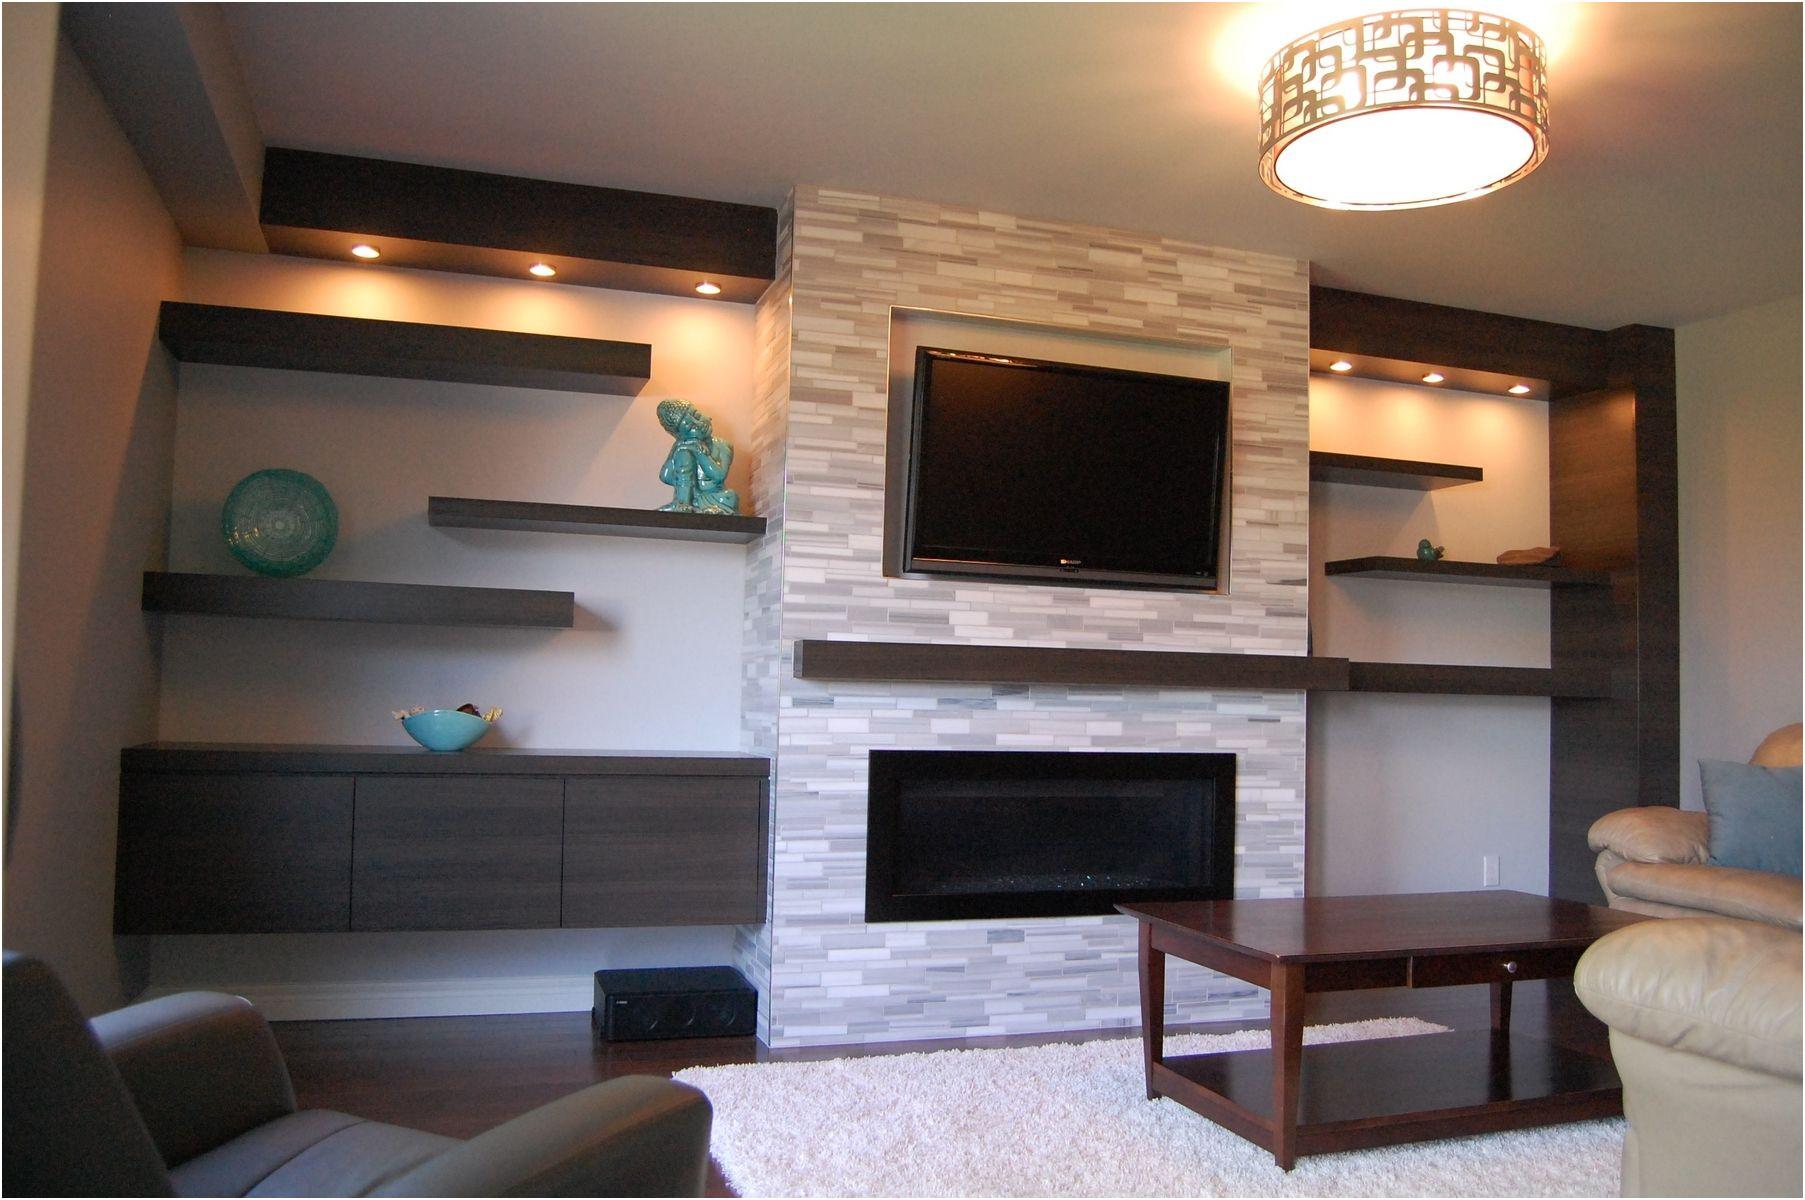 Awesome Wall Mounted Fireplace Ideas